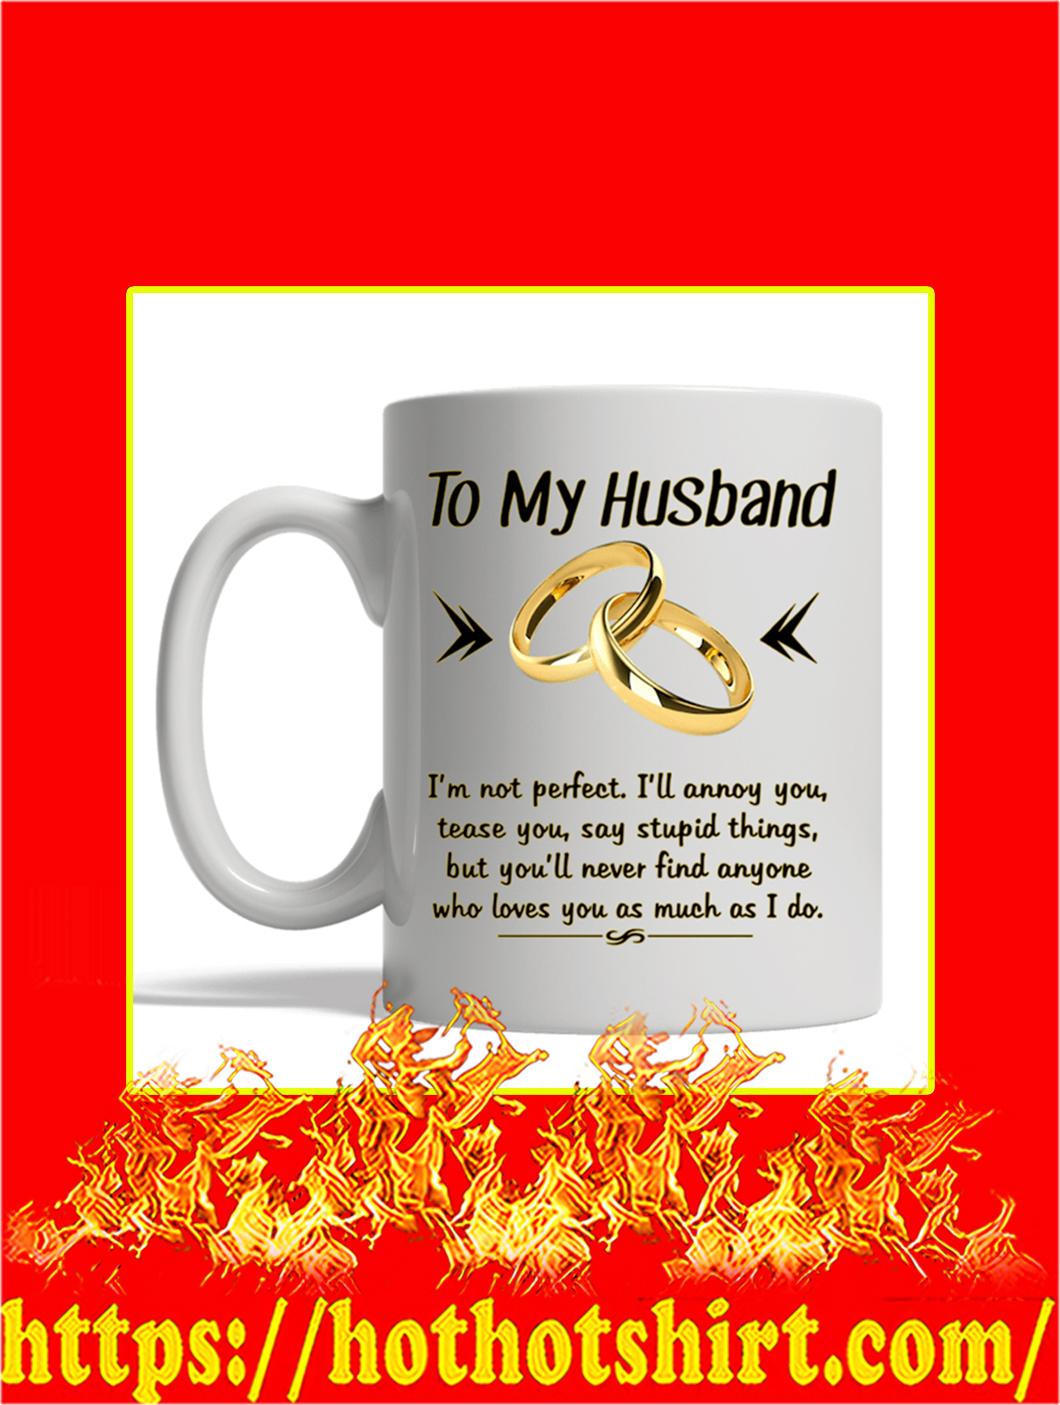 To My Husband I'm Not Perfect Mug- white mug